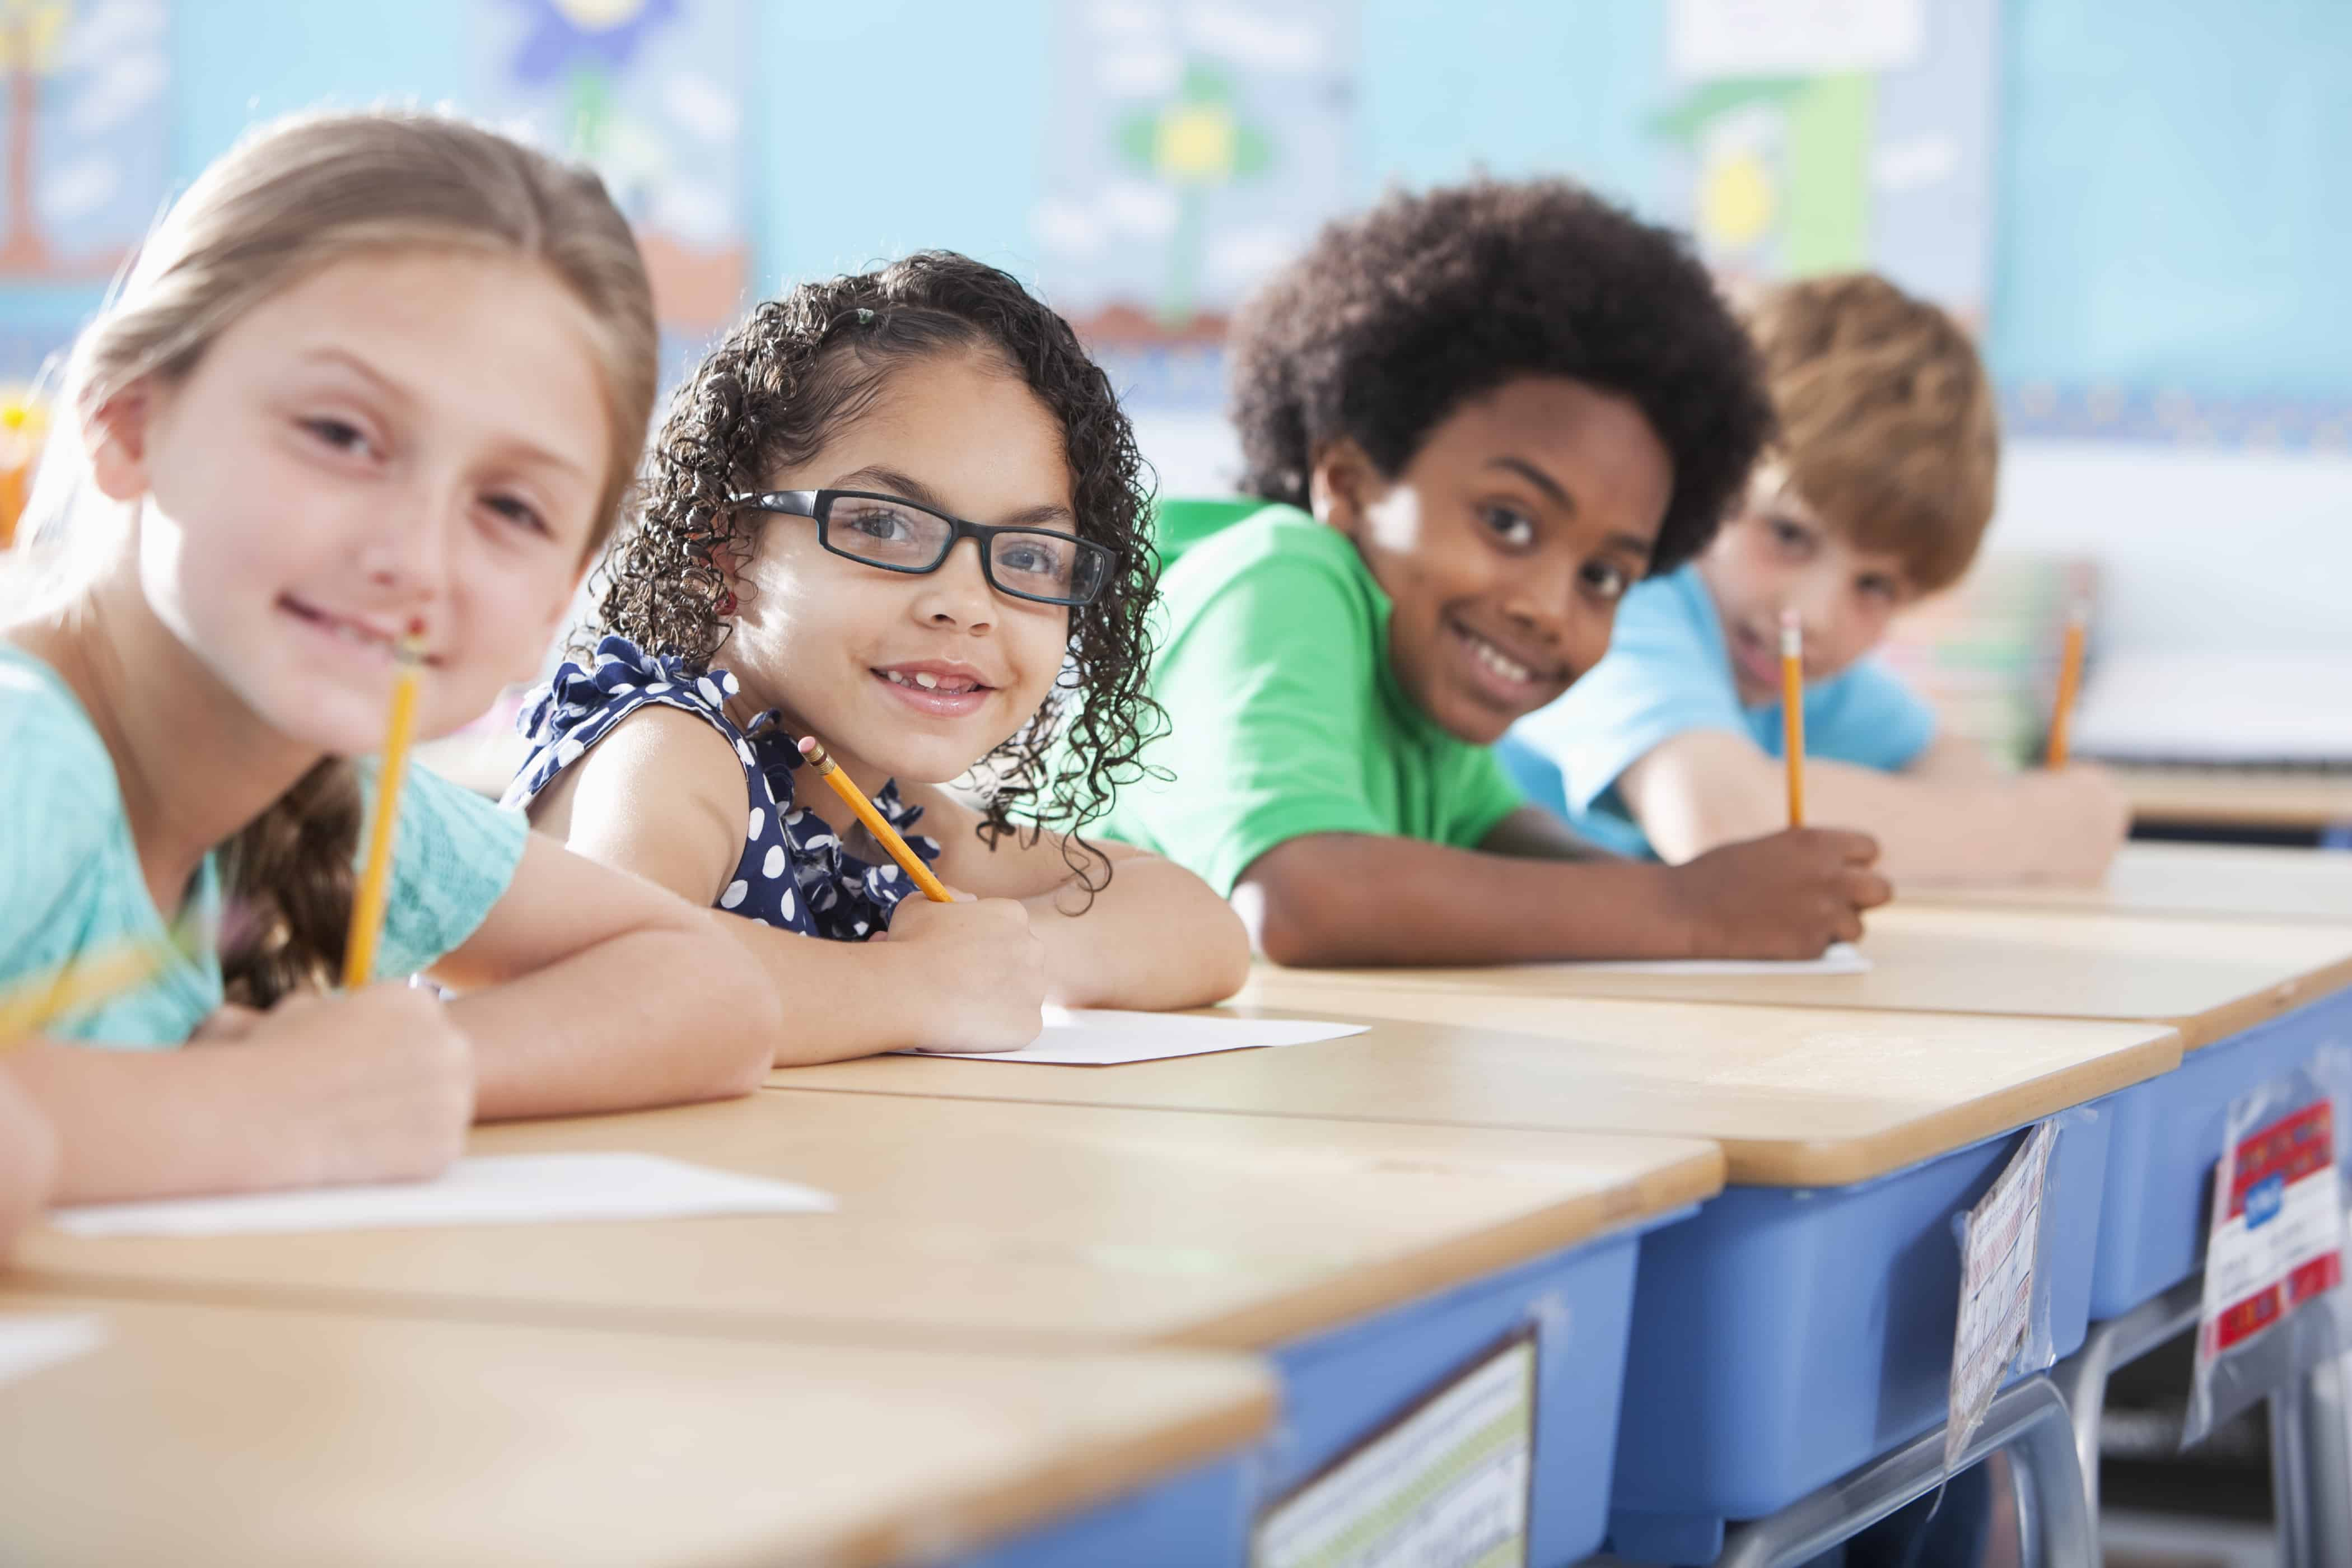 Elementary school kids learning; just not financial education.